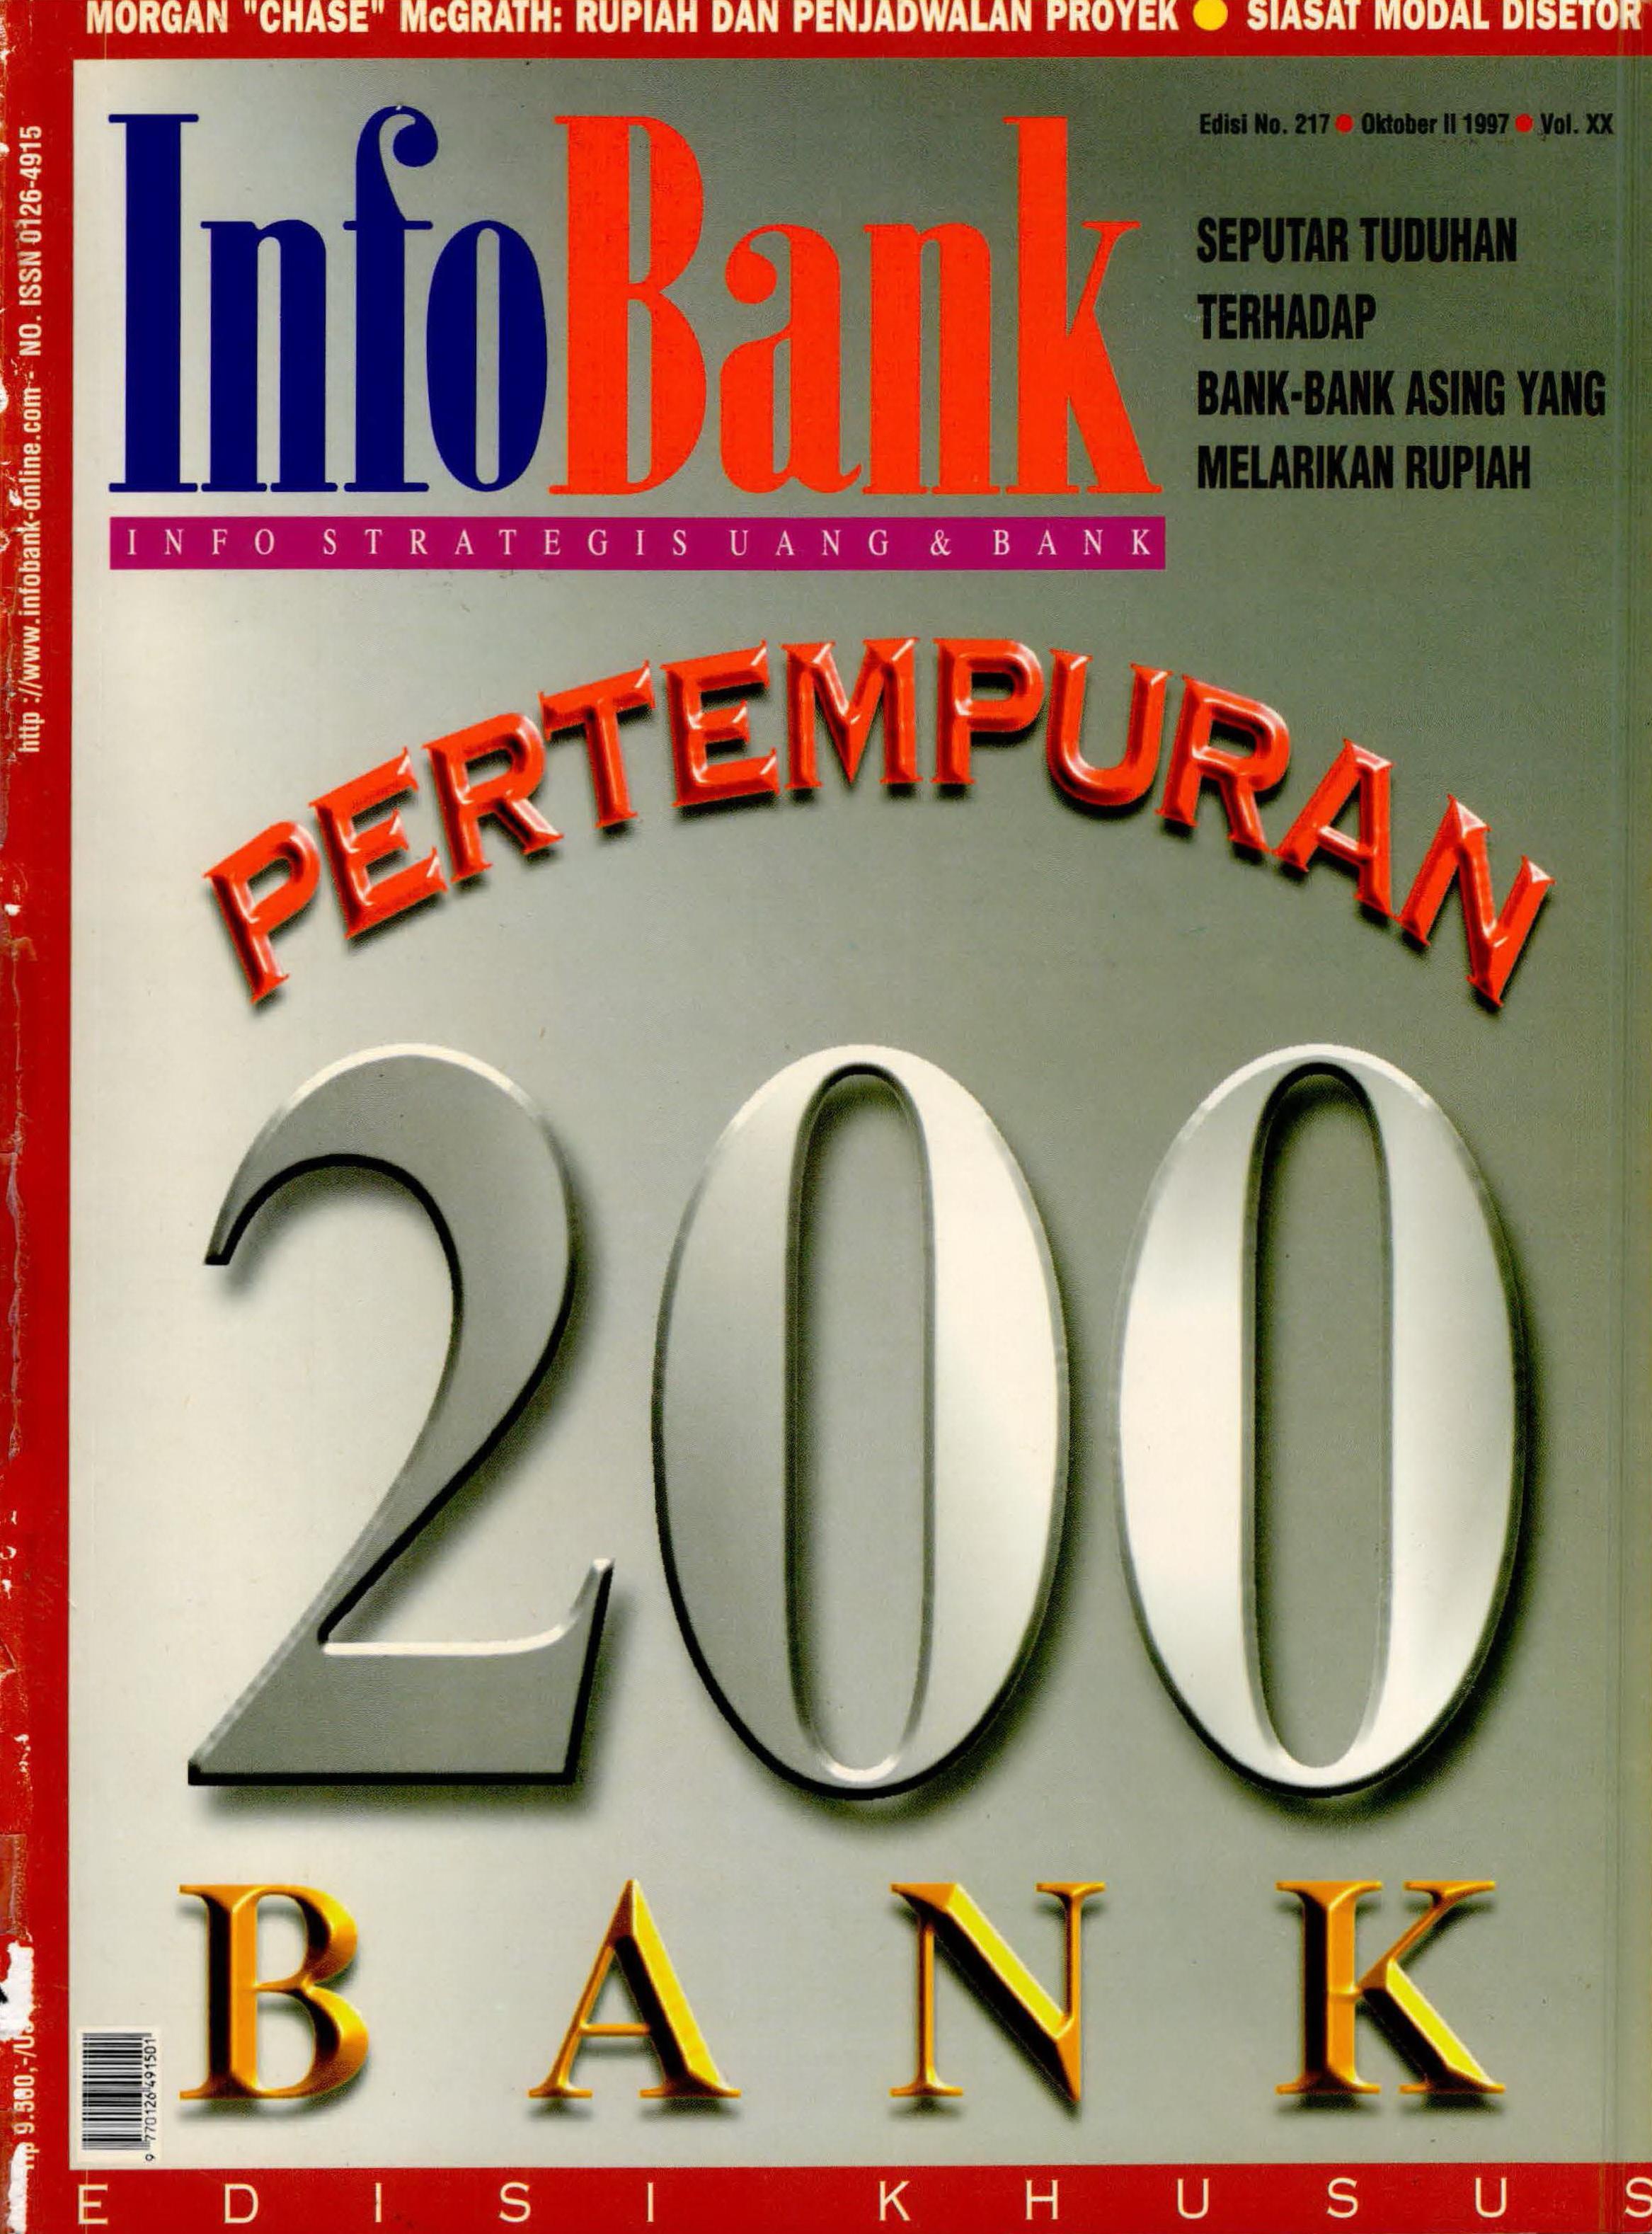 Infobank Edisi Oktober II 1997